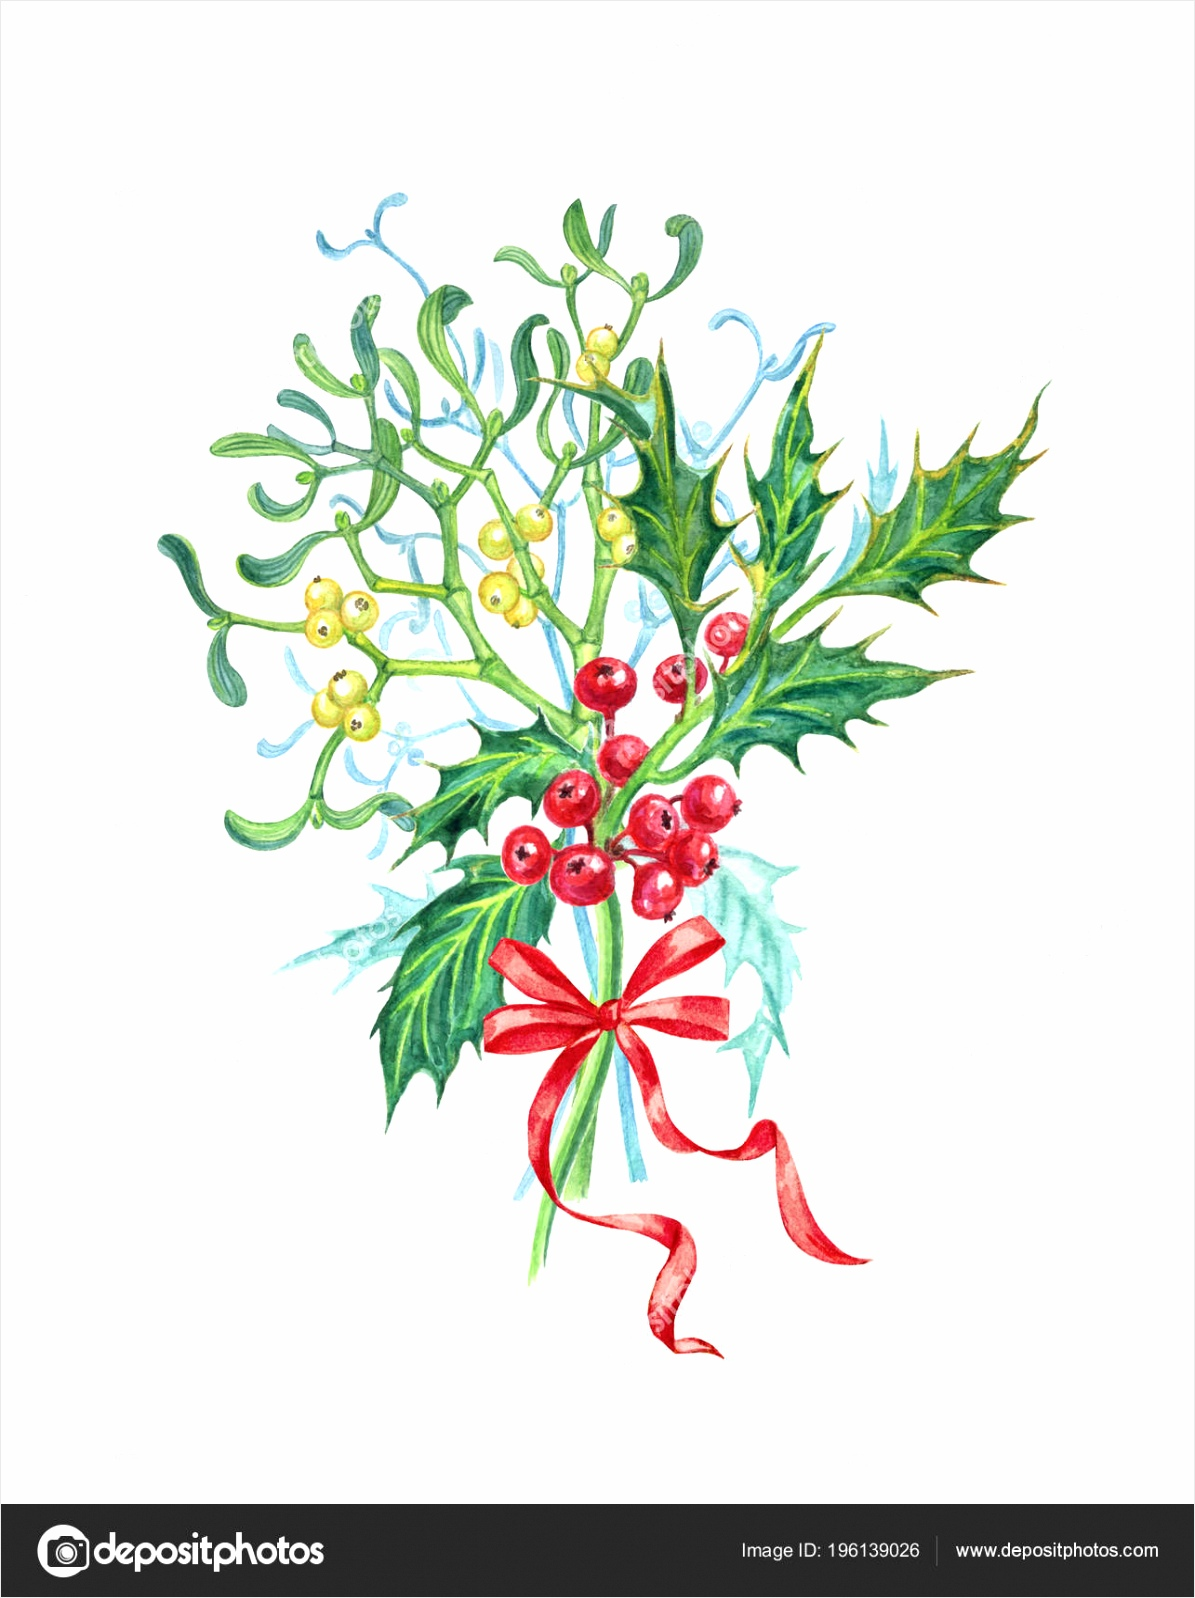 depositphotos stock photo bouquet mistletoe holly bow christmas pyuwy